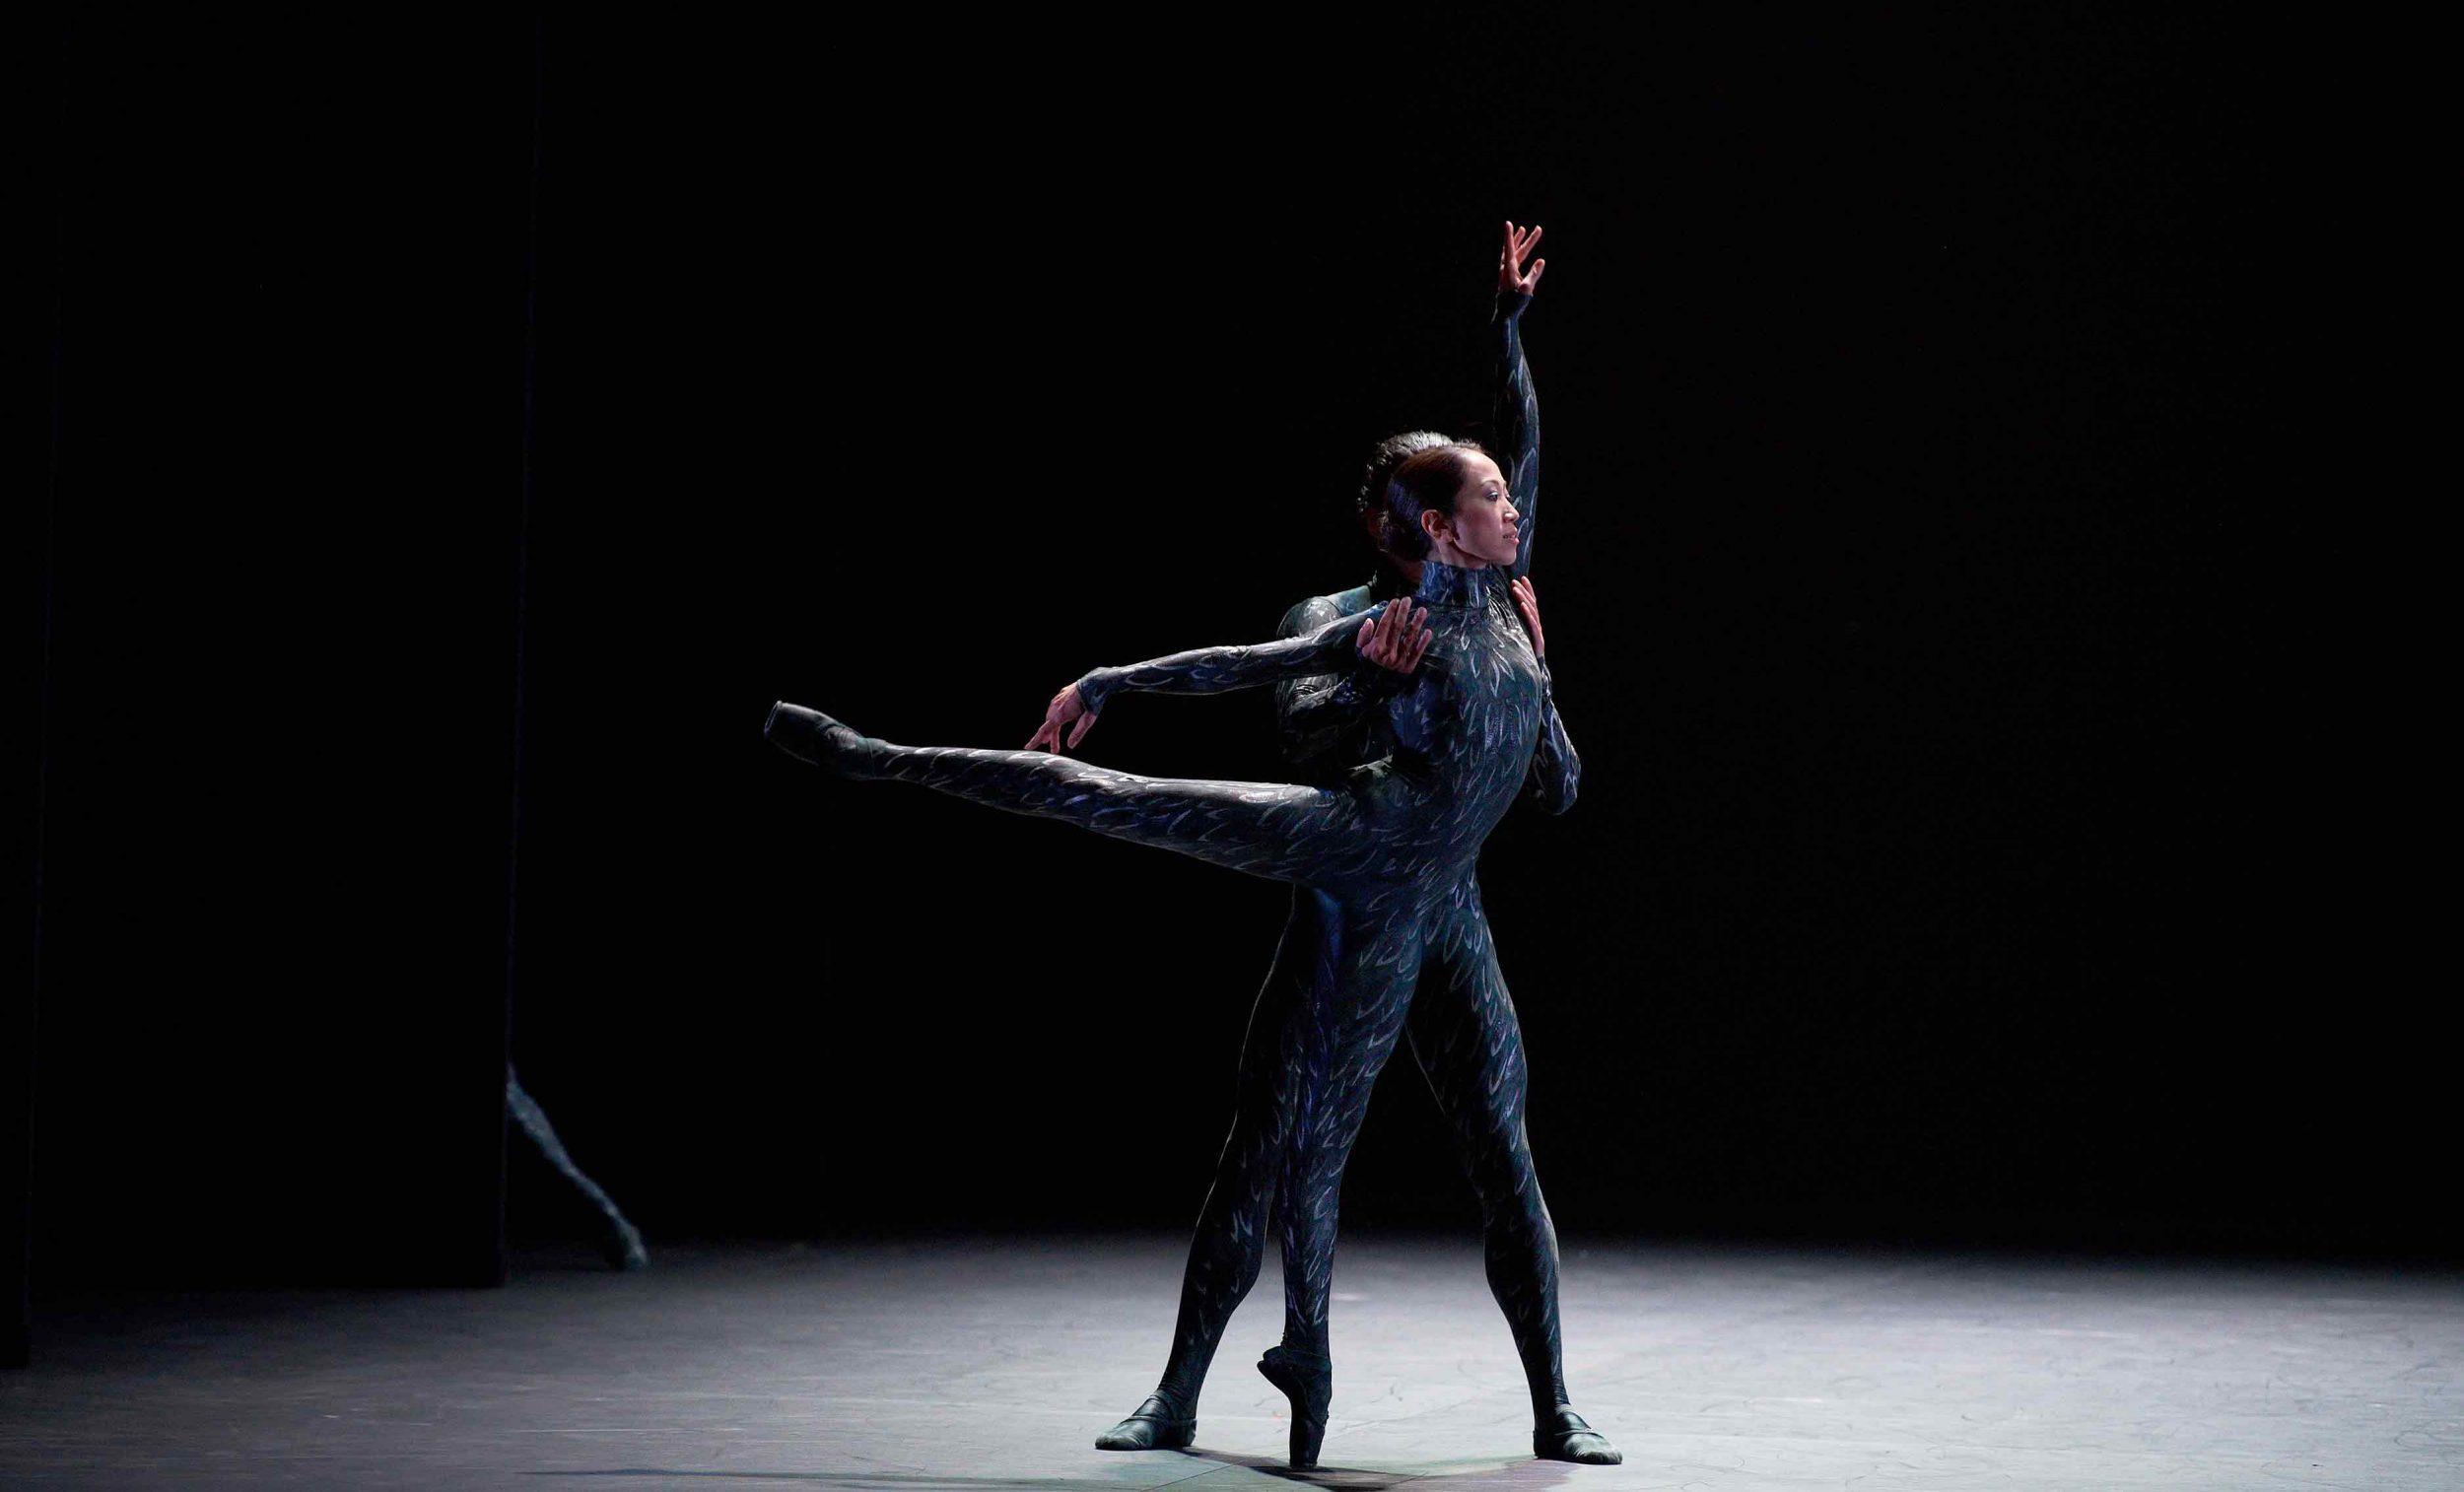 Erina-Takahashi-and-Isaac-Hernandez-in-Fantastic-Beings-by-Aszure-Barton-©-Laurent-Liotardo-(3)